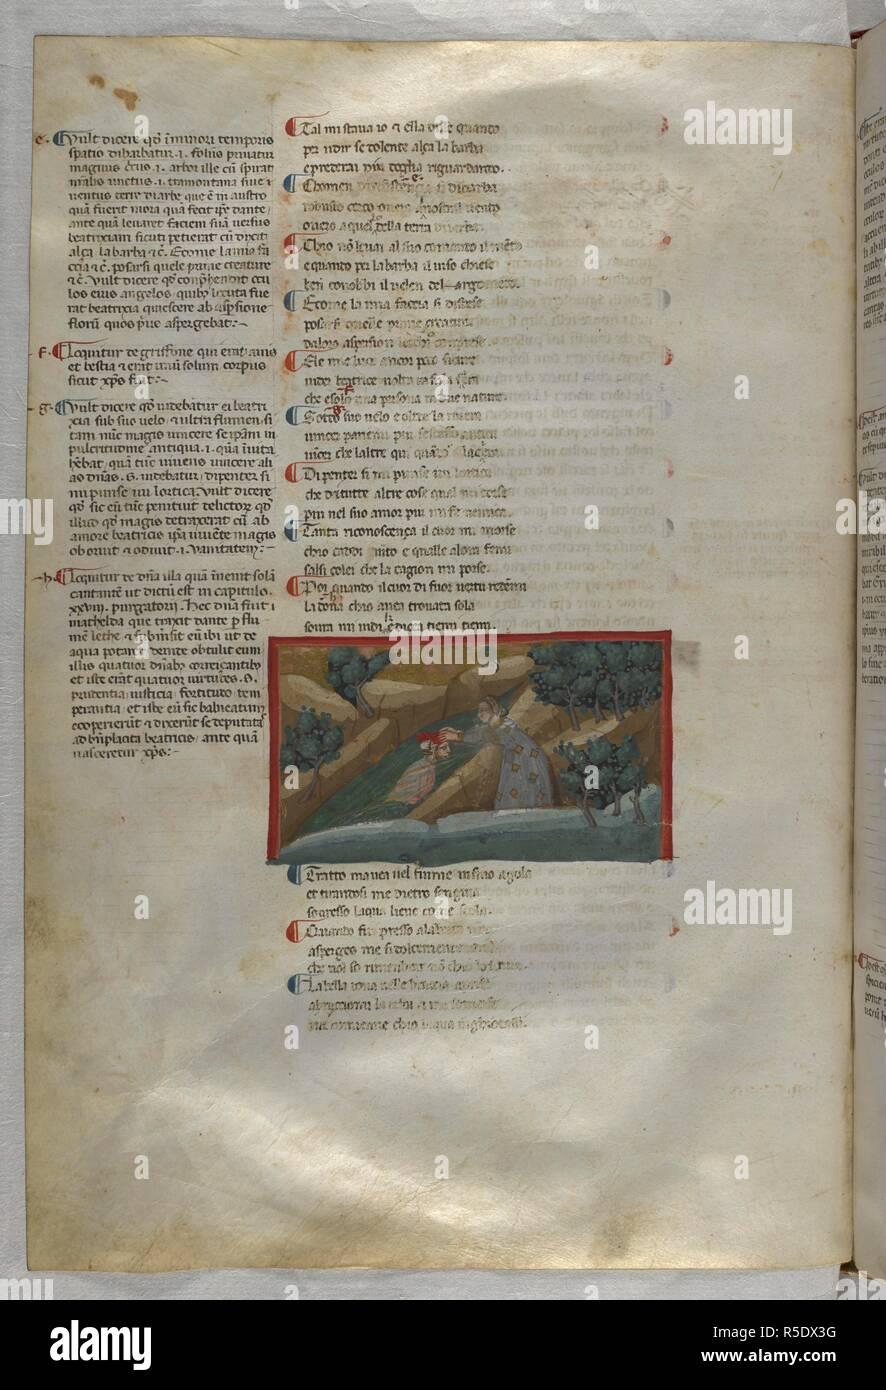 Purgatoria: Matilda immerses Dante in the River Lethe. Dante Alighieri, Divina Commedia ( The Divine Comedy ), with a commentary in Latin. 1st half of the 14th century. Source: Egerton 943, f.120v. Language: Italian, Latin. - Stock Image